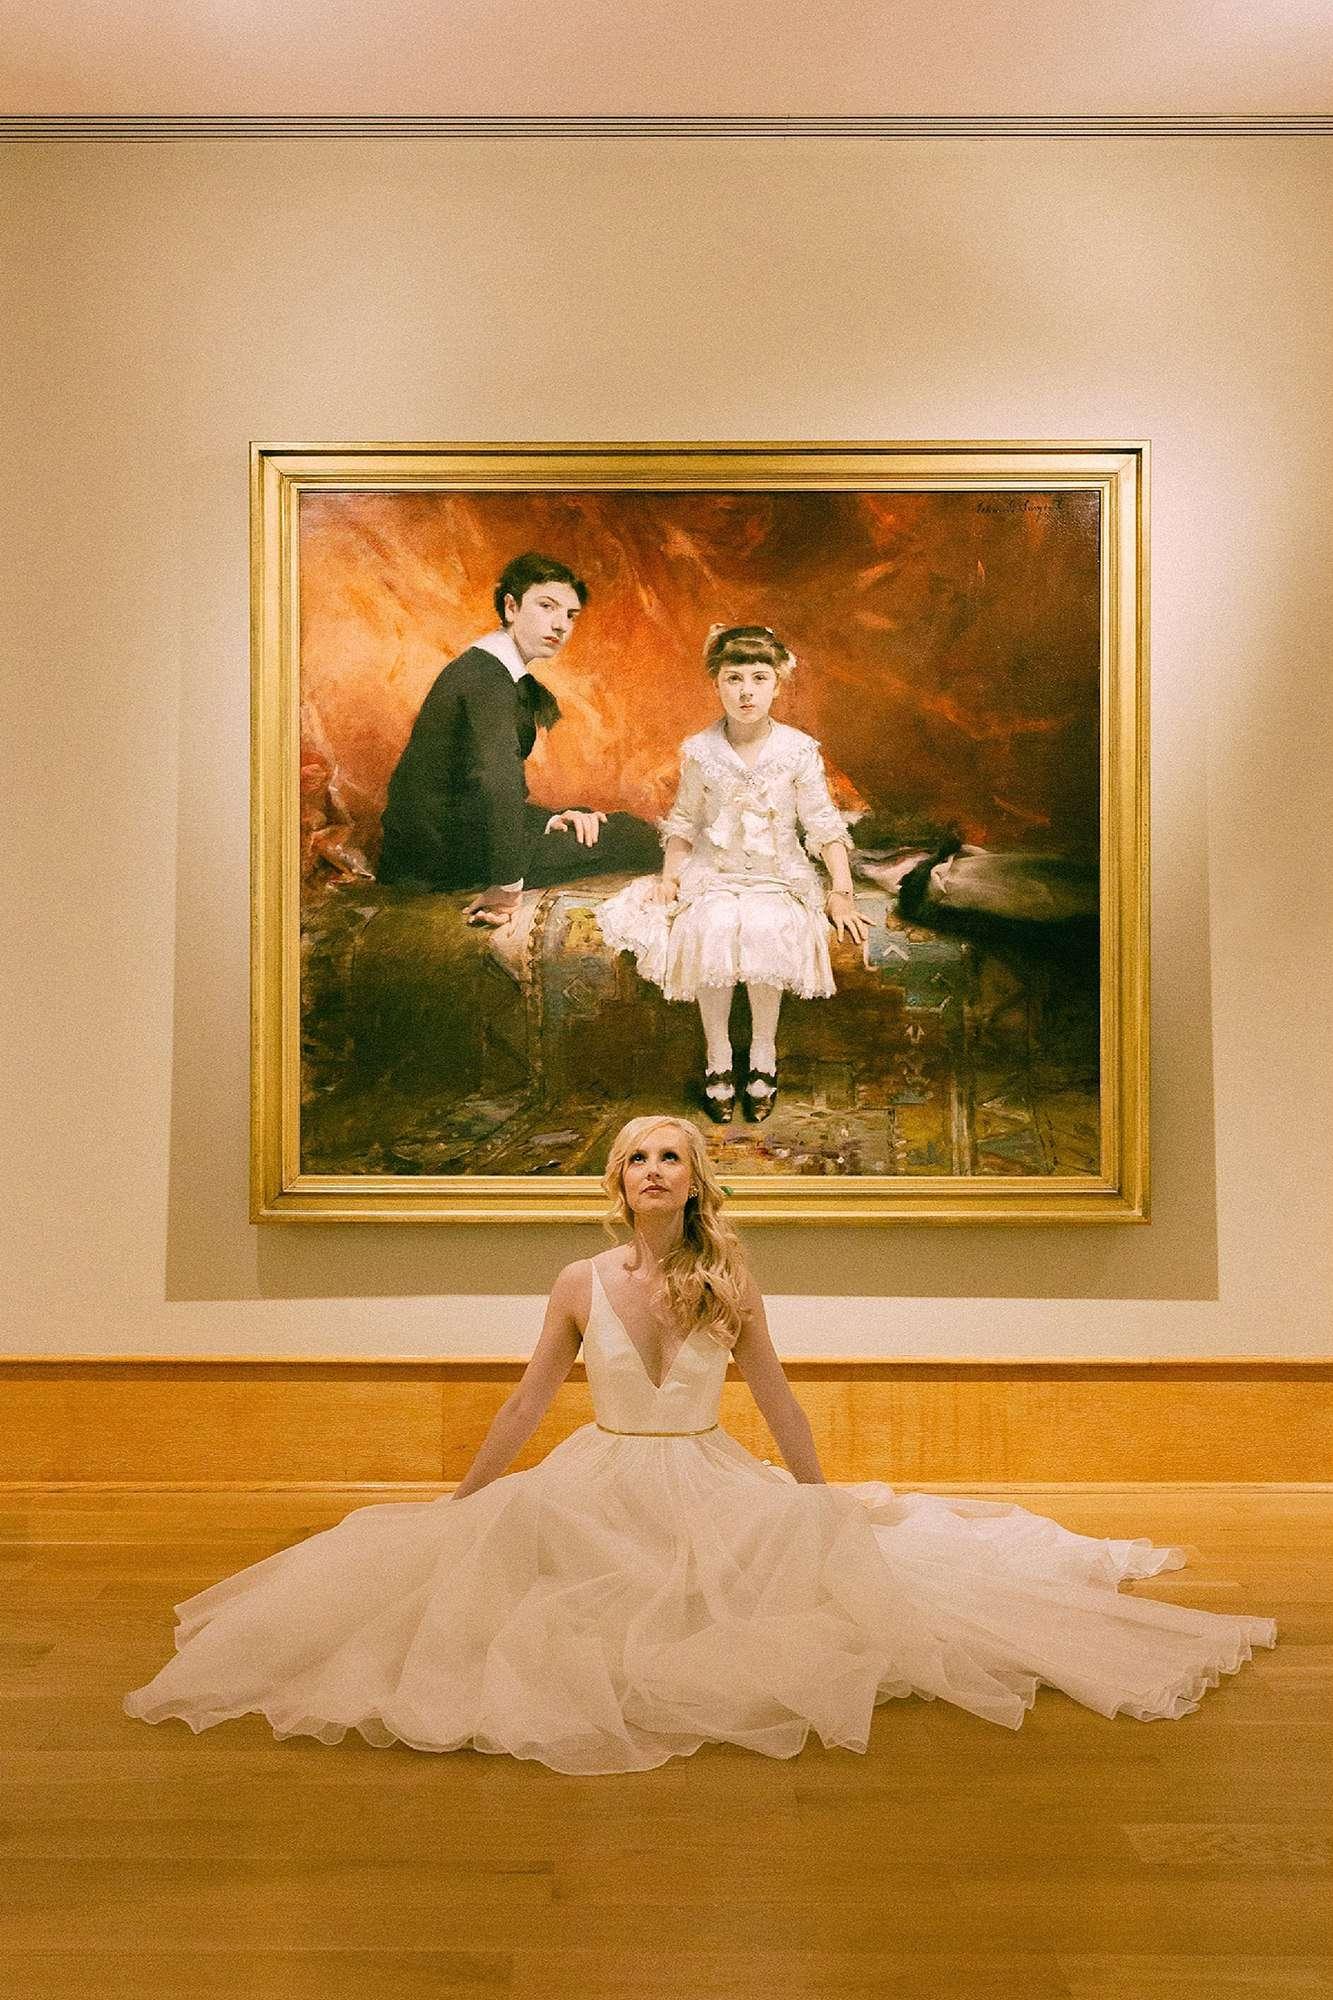 des moines art center wedding bride in gallery